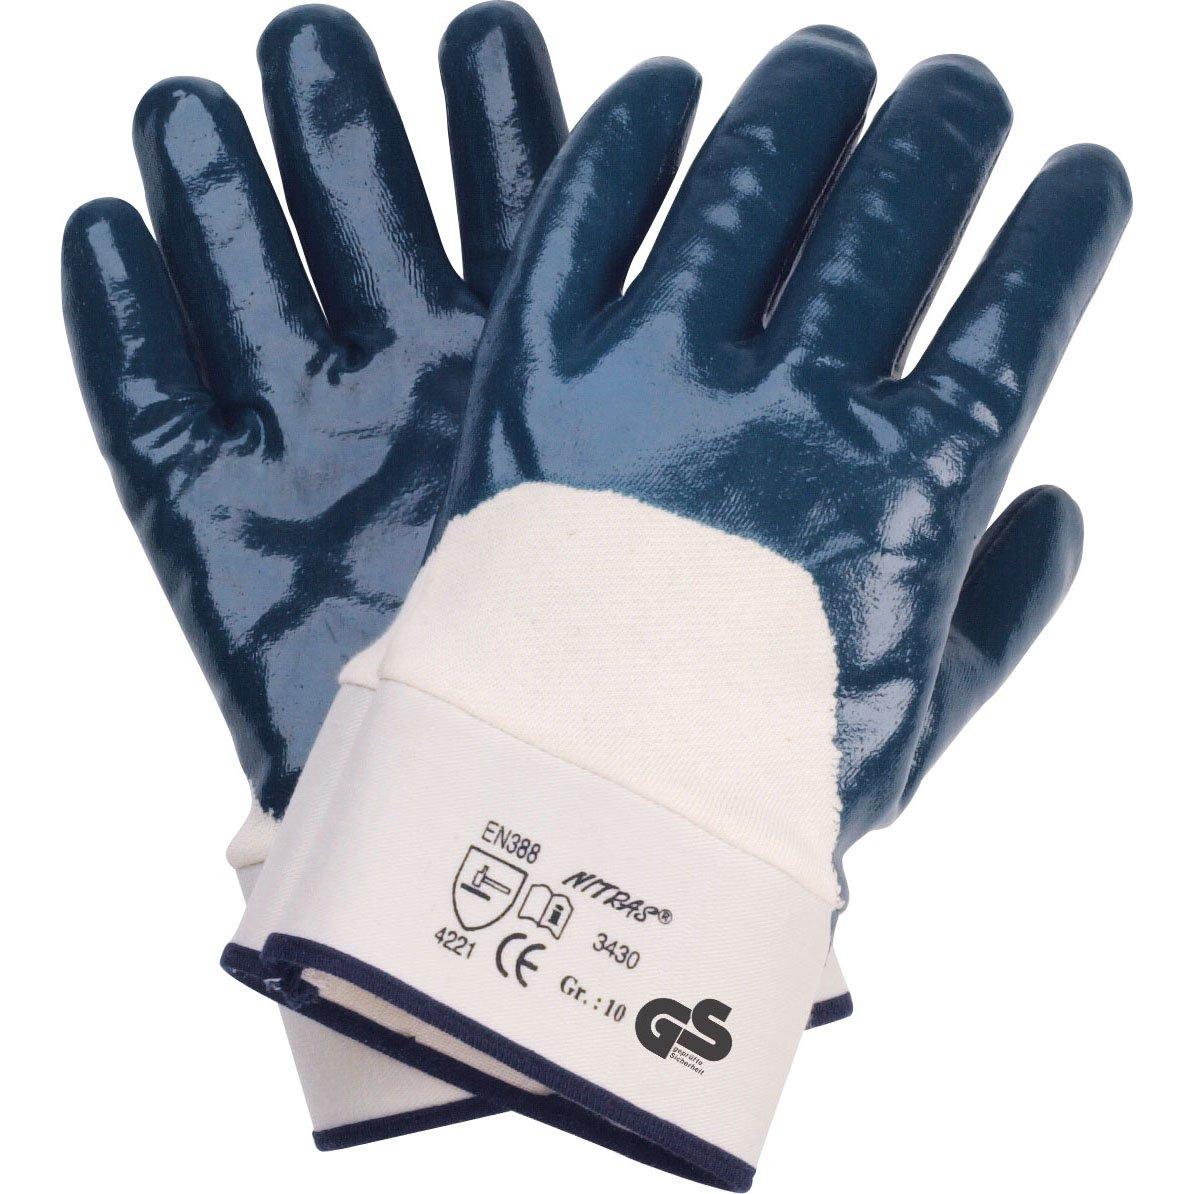 72 Paar NITRAS 3430 Nitril Handschuh blau Stulpe, Gr.: 10